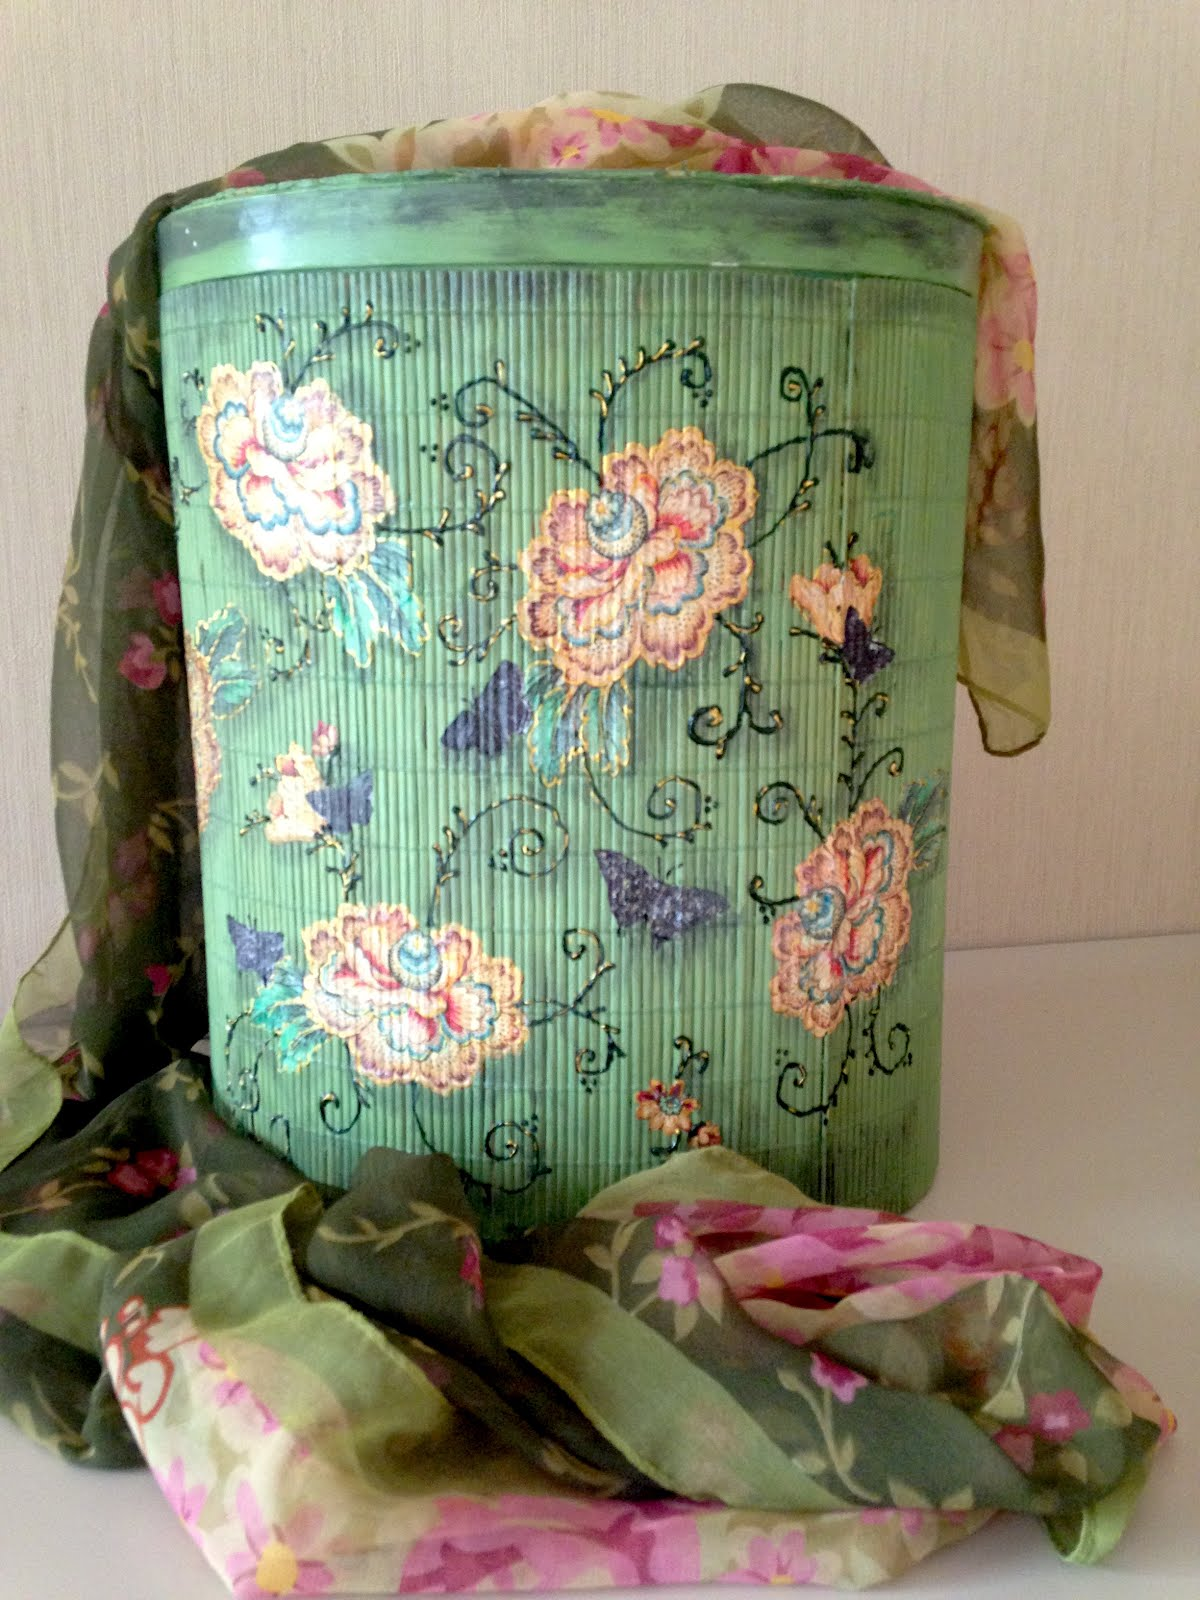 Caja Decorada con Decoupage sobre Esterilla de Bambú ~ Disfruta Creando